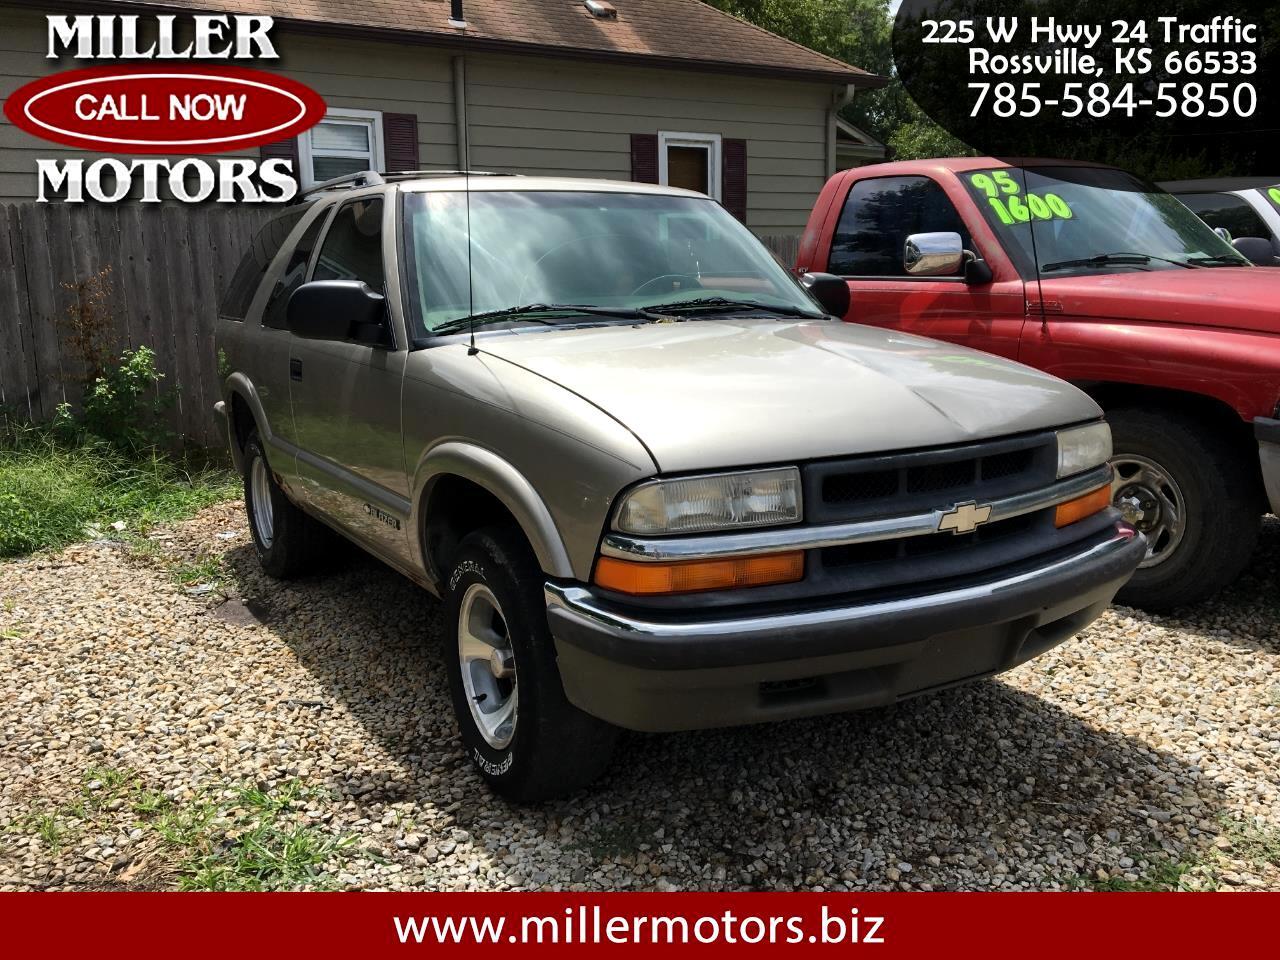 2000 Chevrolet Blazer 2dr LS